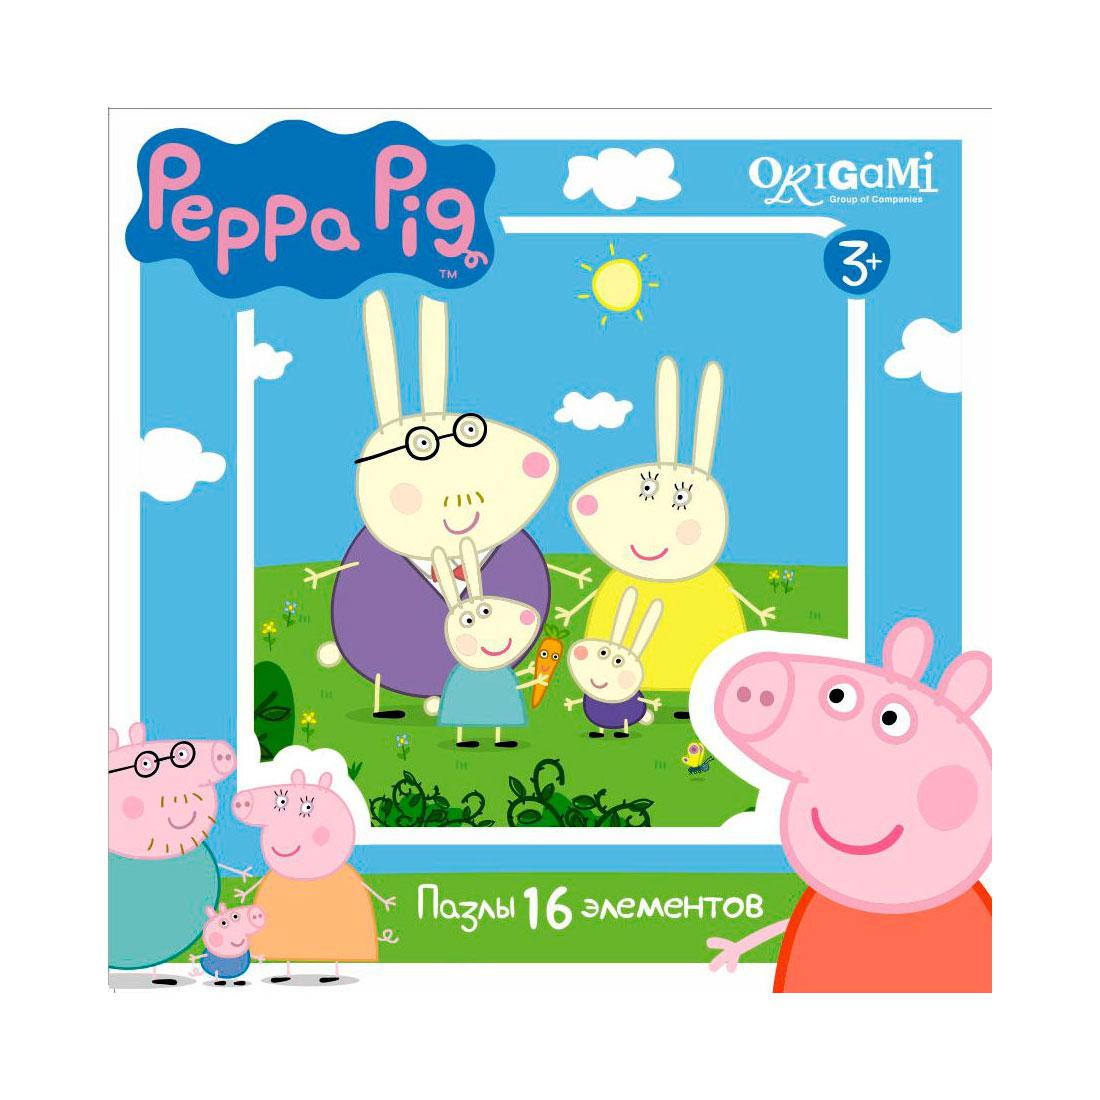 Пазл Origami Peppa Pig 1577<br>